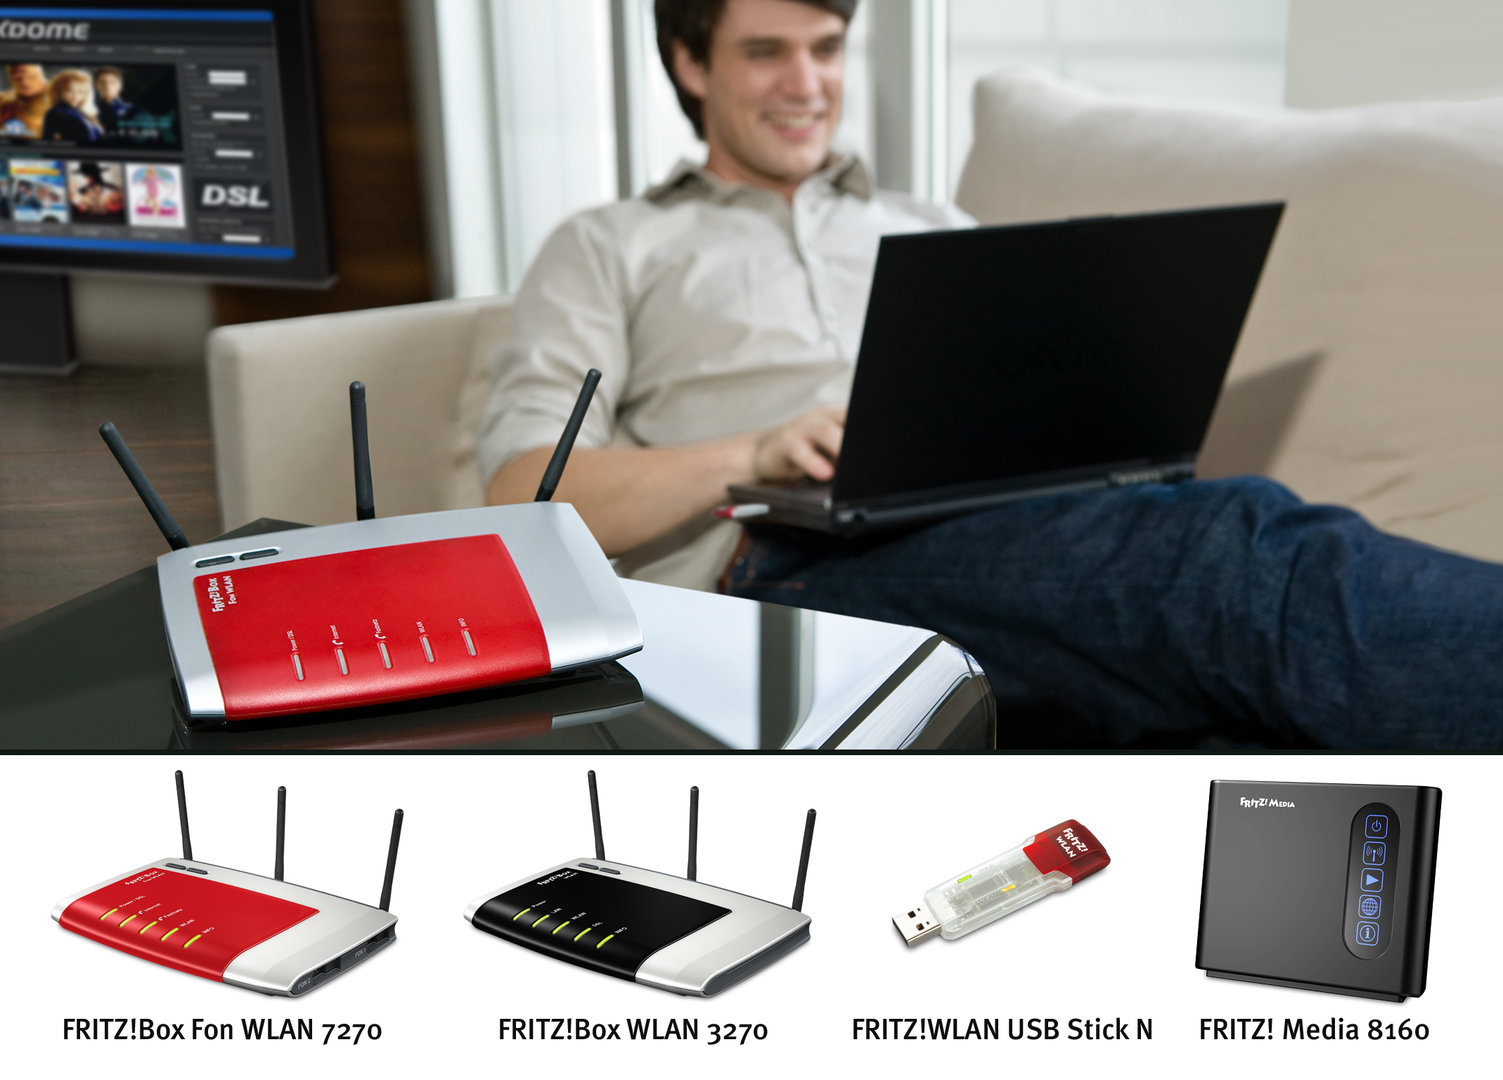 AVM: Neuvorstellung der CeBIT 2008 (FRITZ!Box WLAN 3270, FRITZ! Media 8160, FRITZ!WLAN Repeater, FRITZ!WLAN USB Stick N)